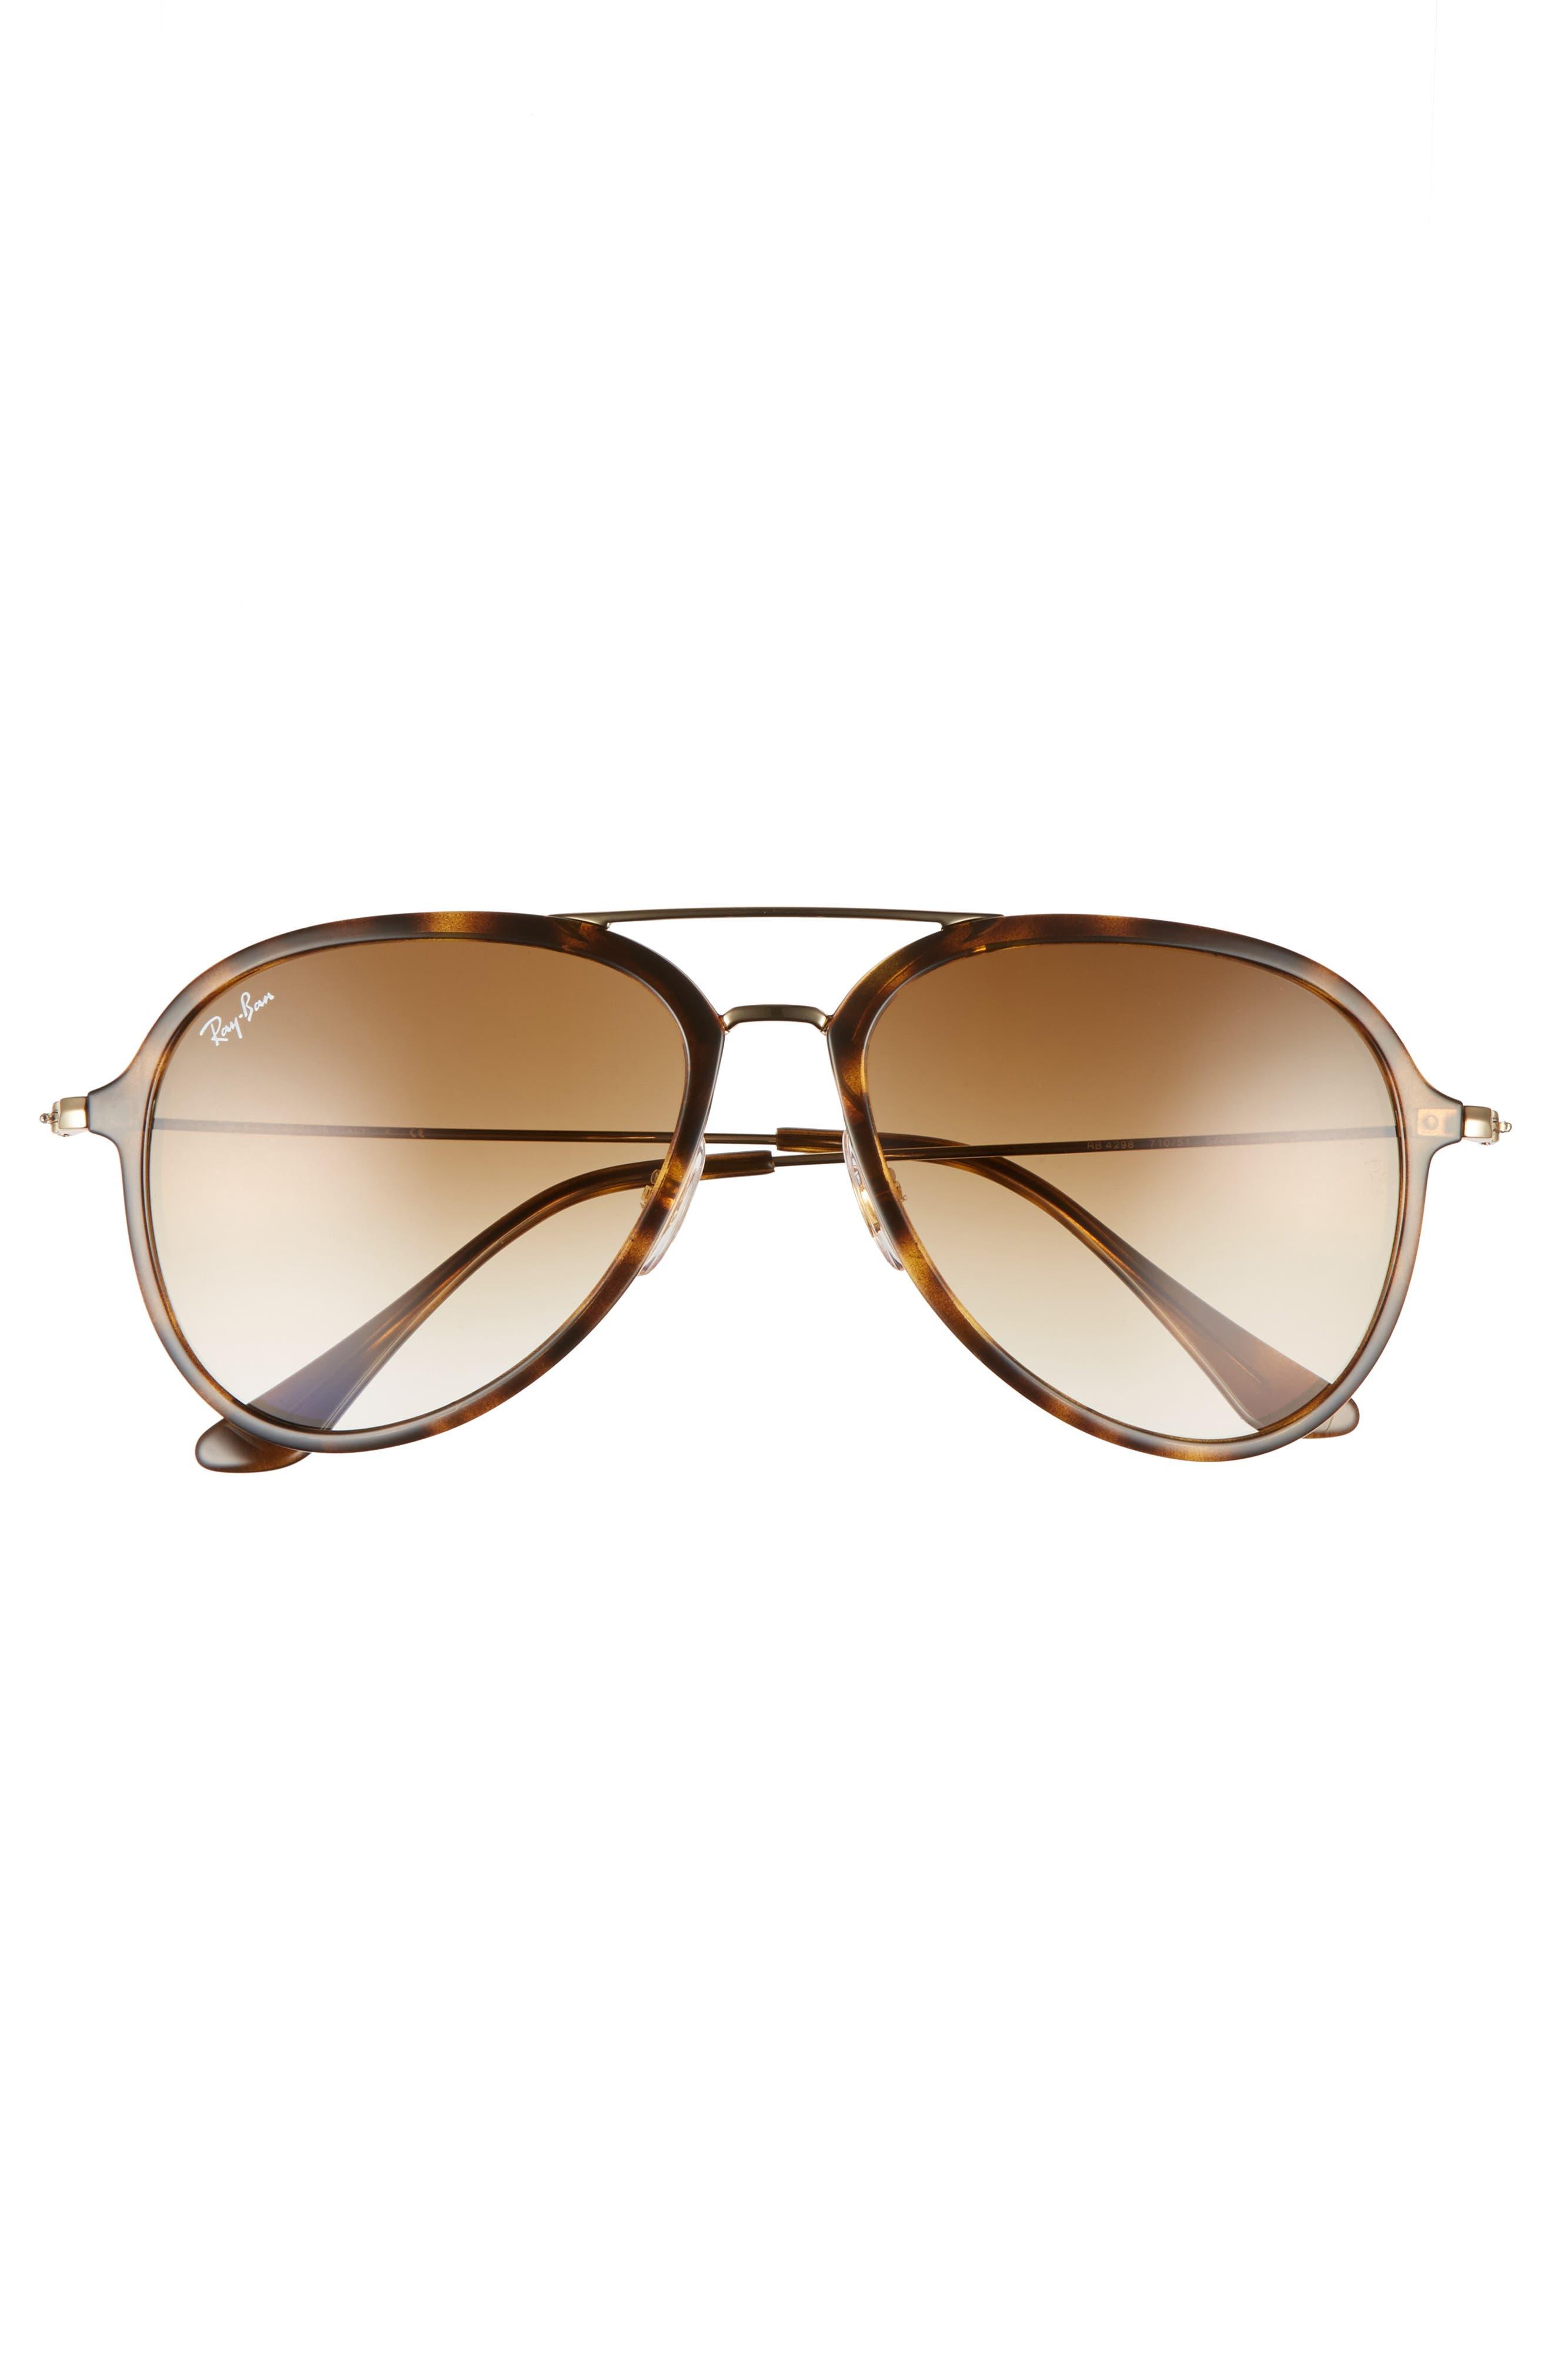 57mm Pilot Sunglasses,                             Alternate thumbnail 3, color,                             LIGHT HAVANA